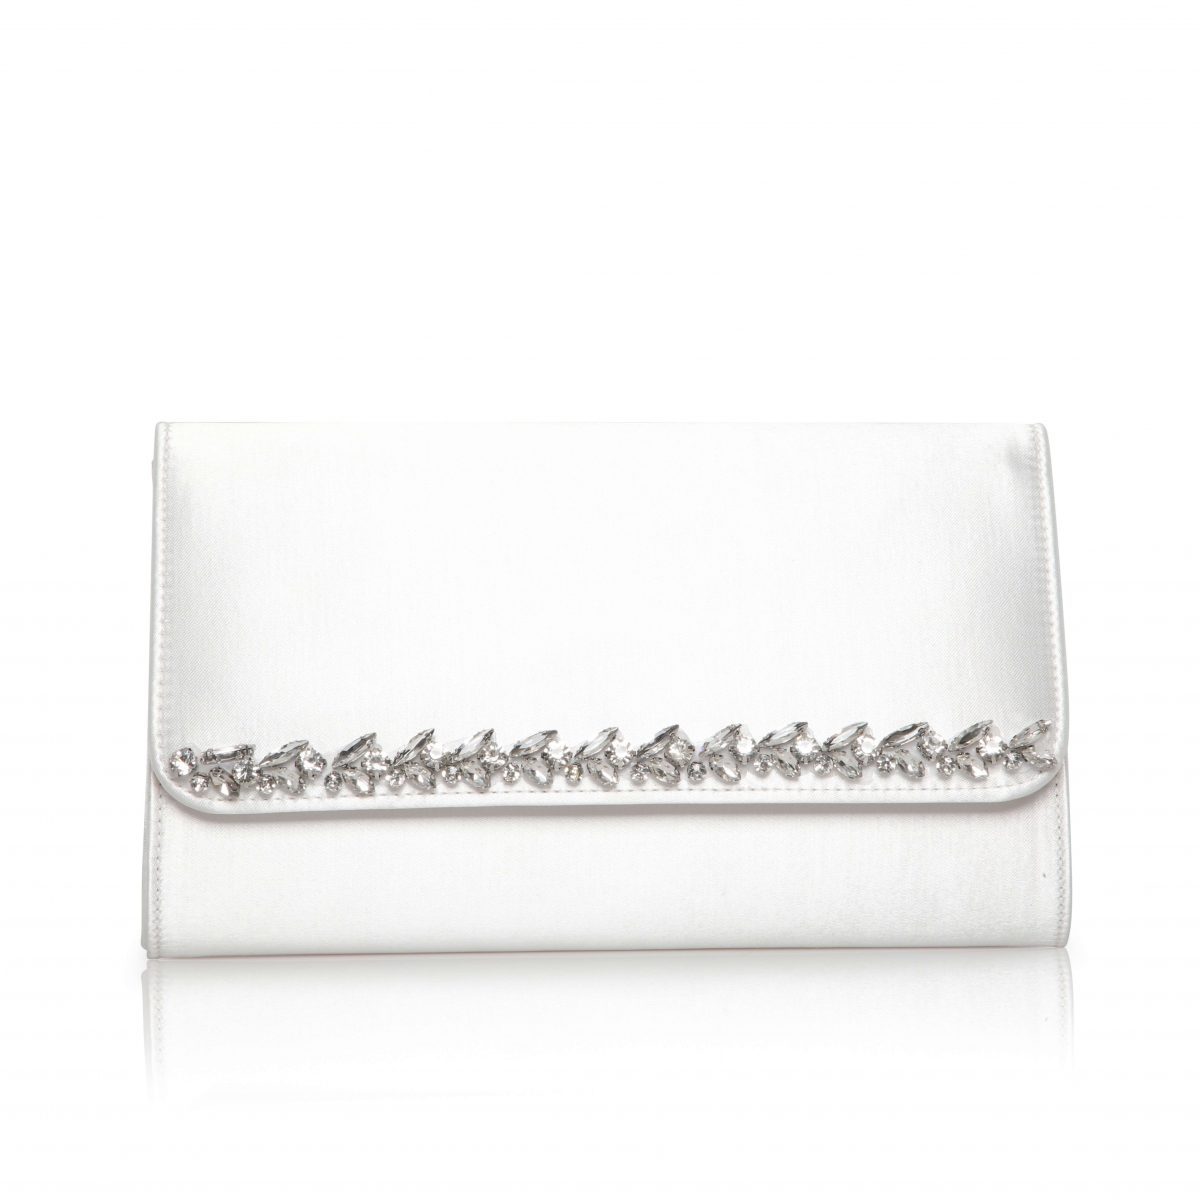 Perfect Bridal Yvette Bridal Bag - Dyeable Satin 1